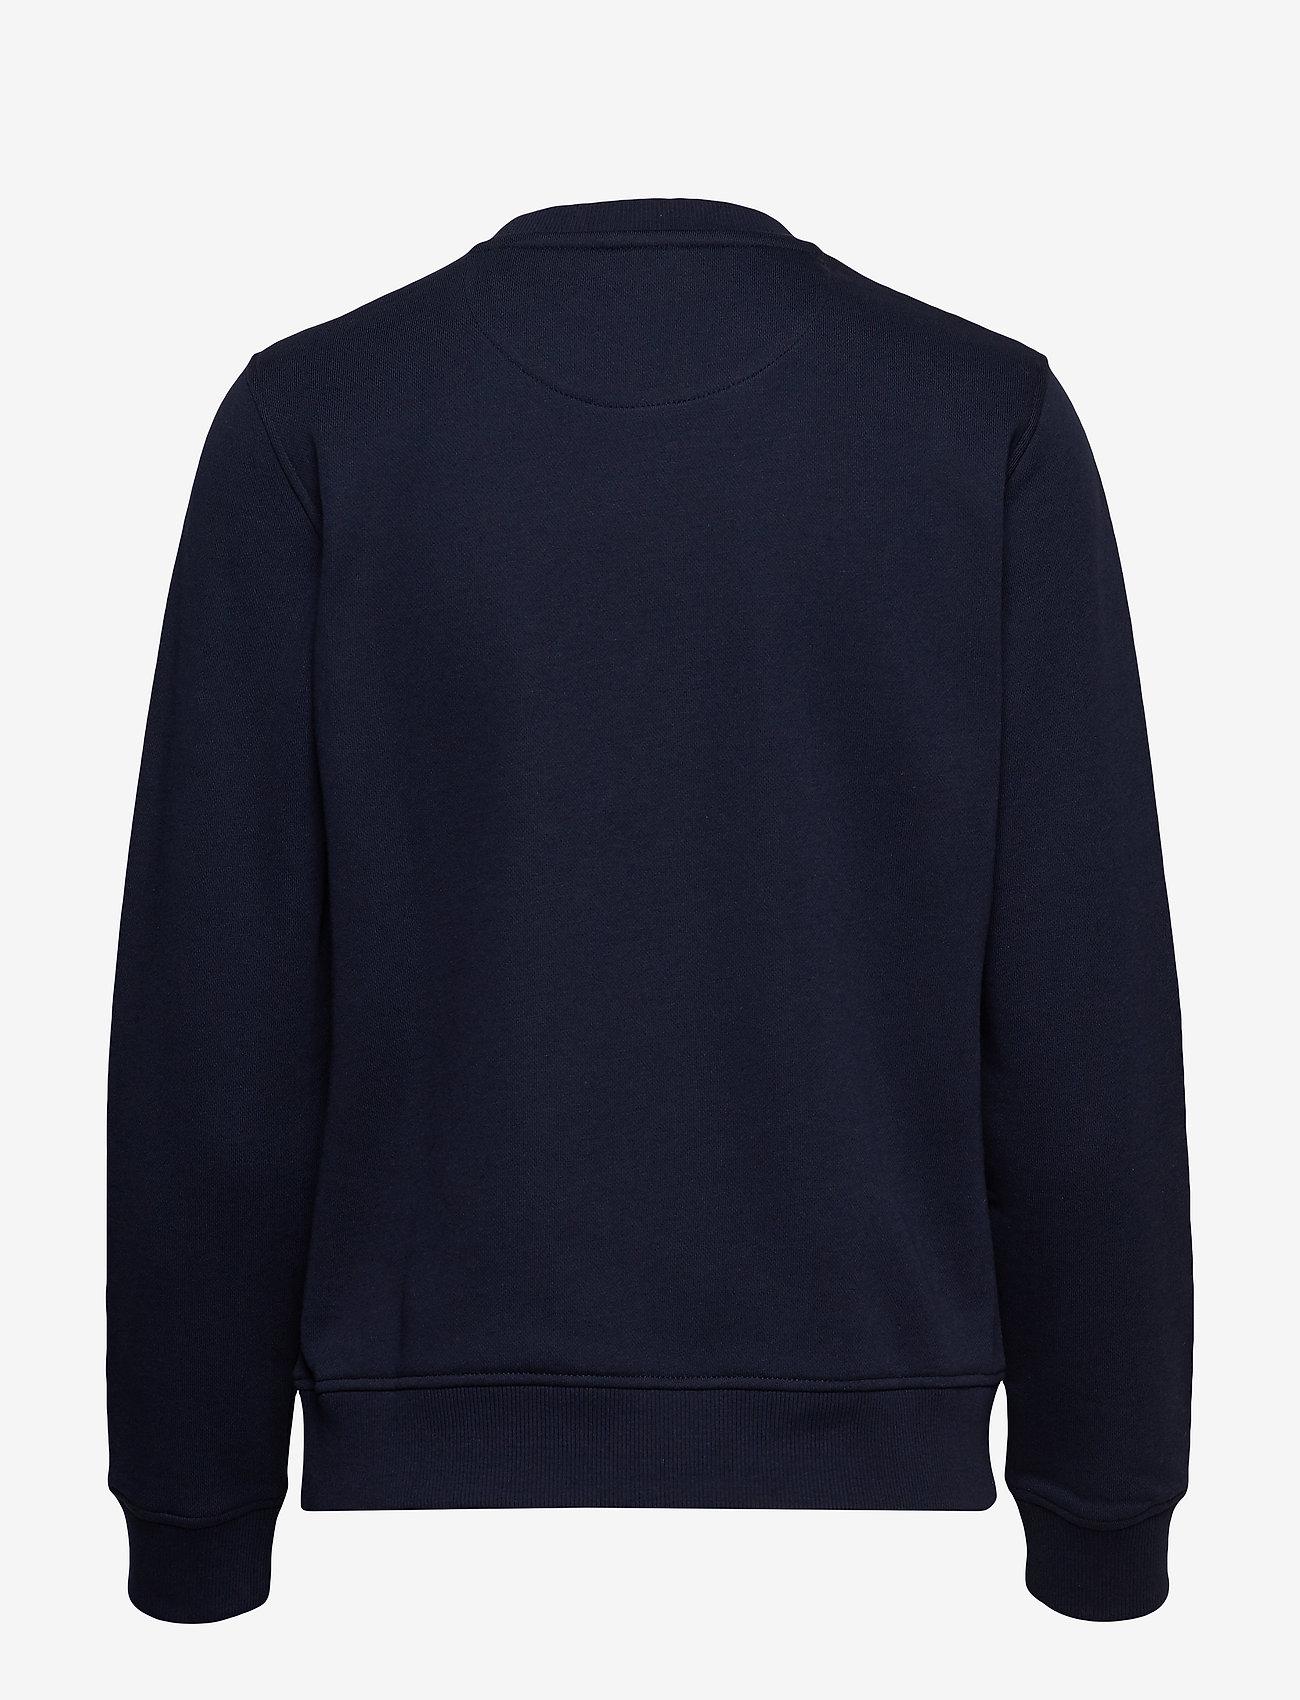 Gant - GANT LOCK UP C-NECK SWEAT - sweatshirts - evening blue